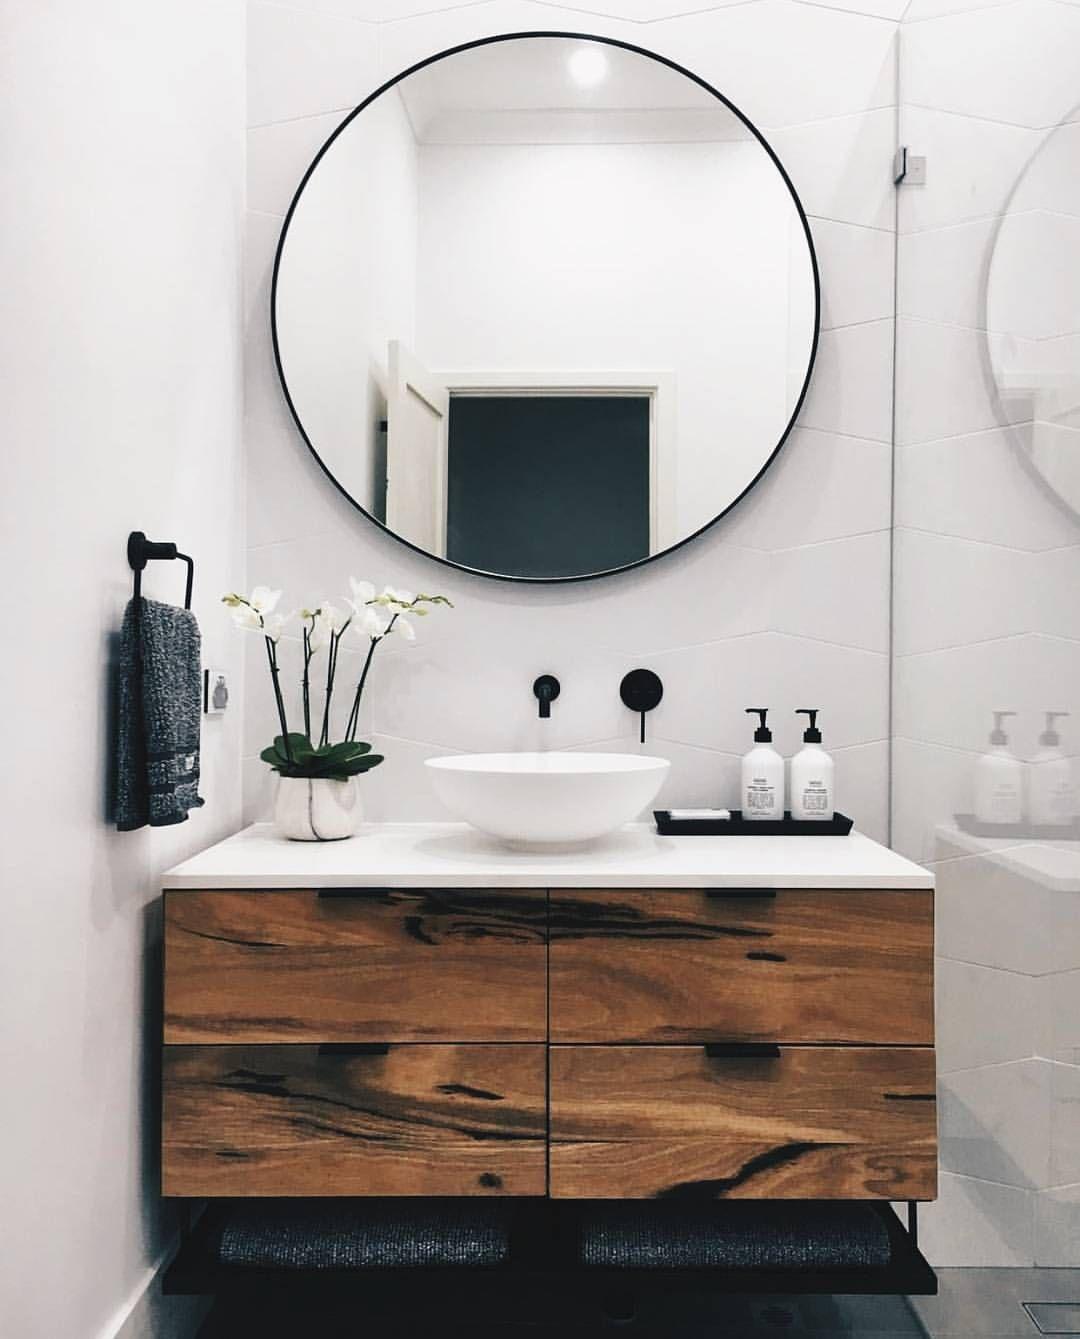 Inspiring Bathroom Mirror Design Idea